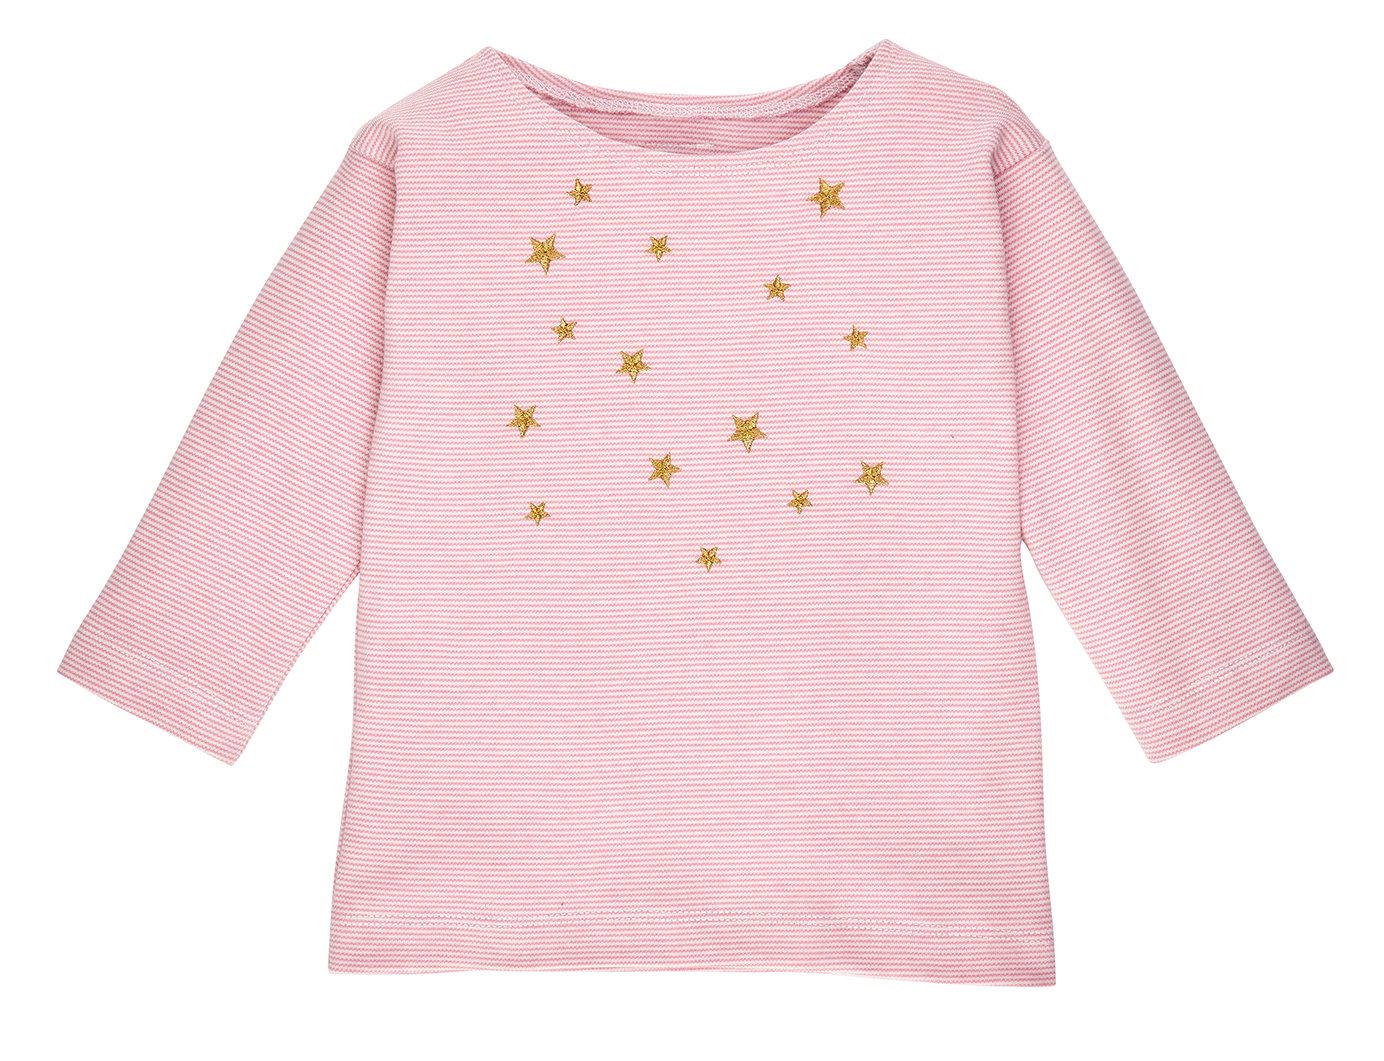 Image of SALE T-shirt rose gestreift mit goldenen Sternen Art. 235226